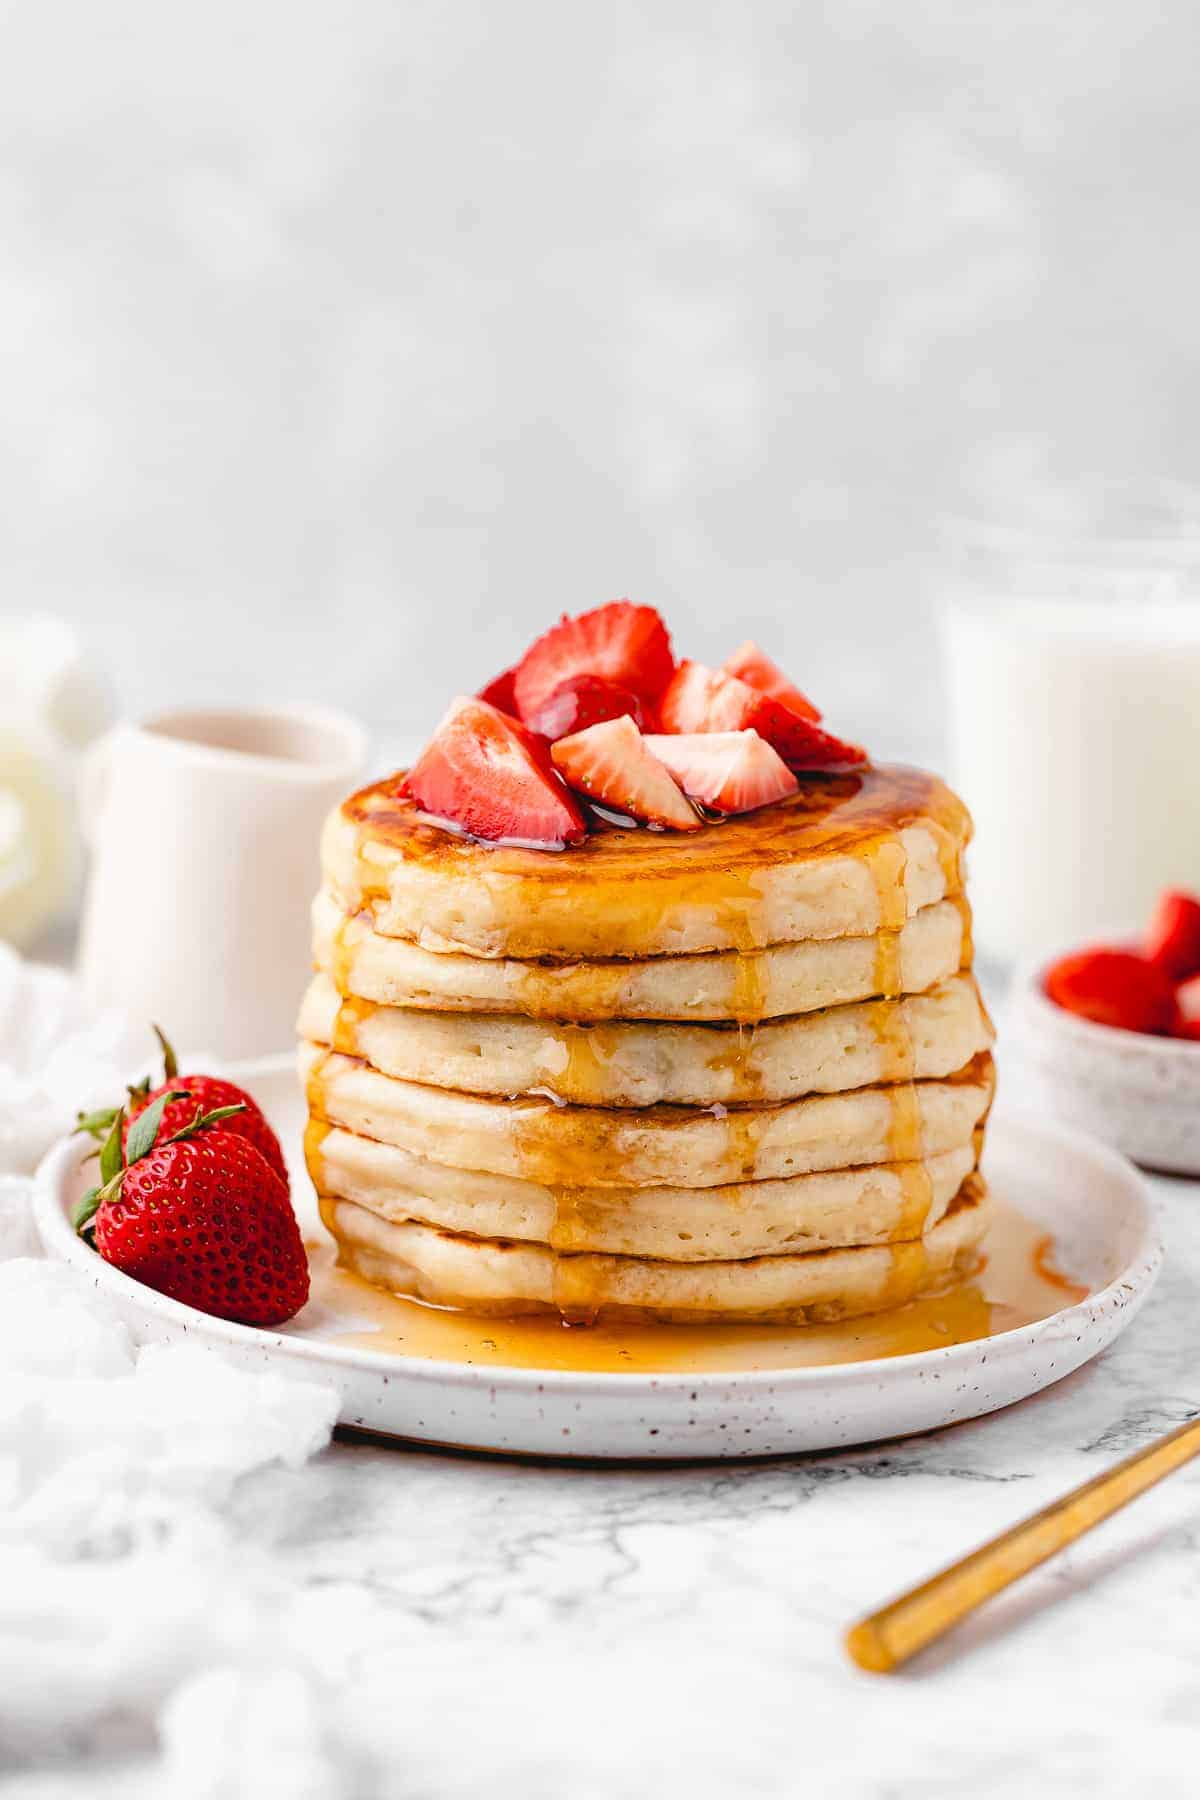 Vegan pancakes and chopped strawberries.